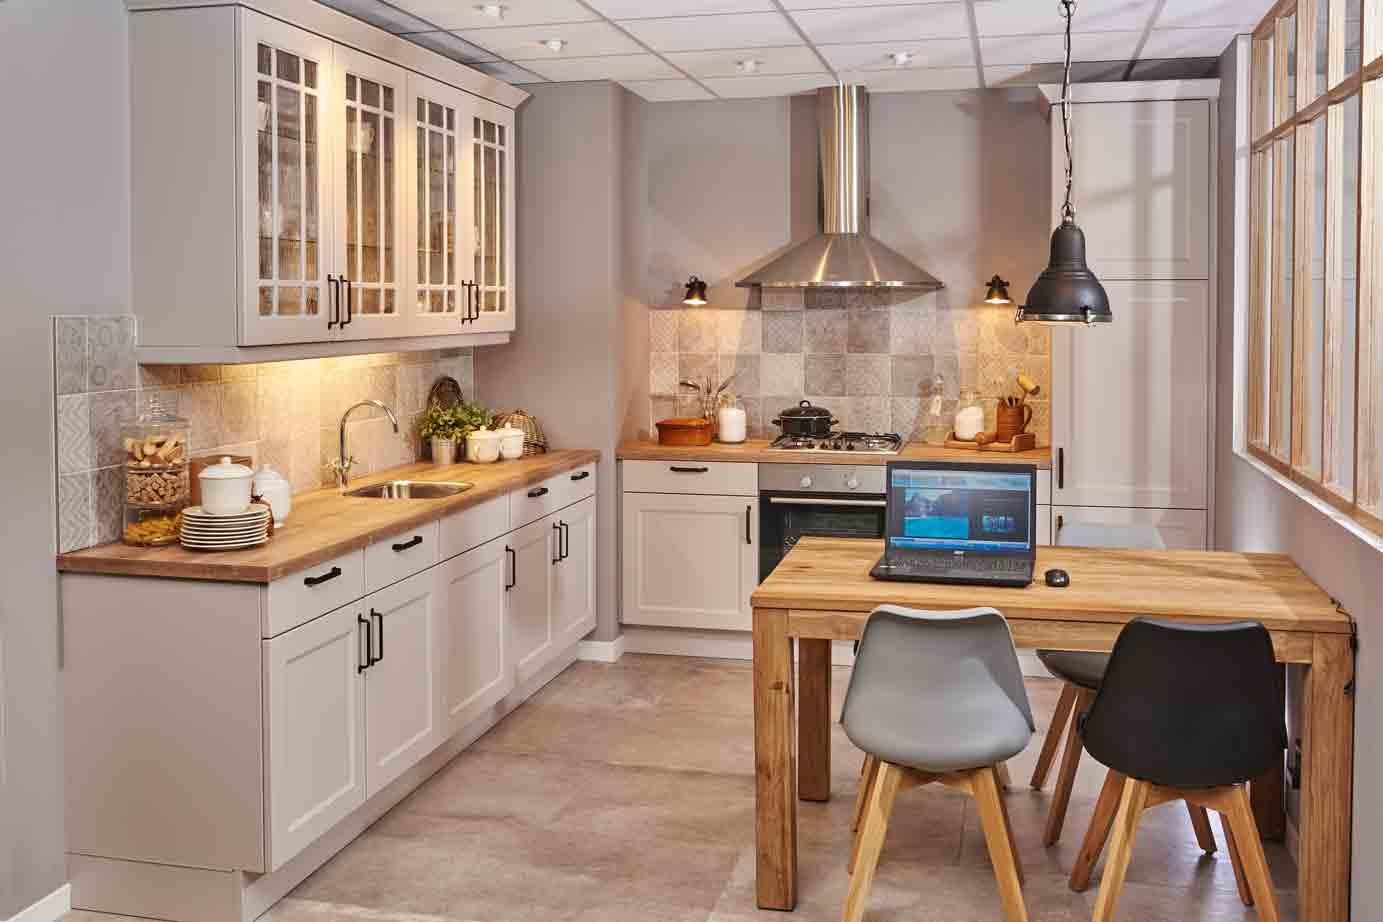 Landelijke Keuken Met Vitrinekastjes Db Keukens